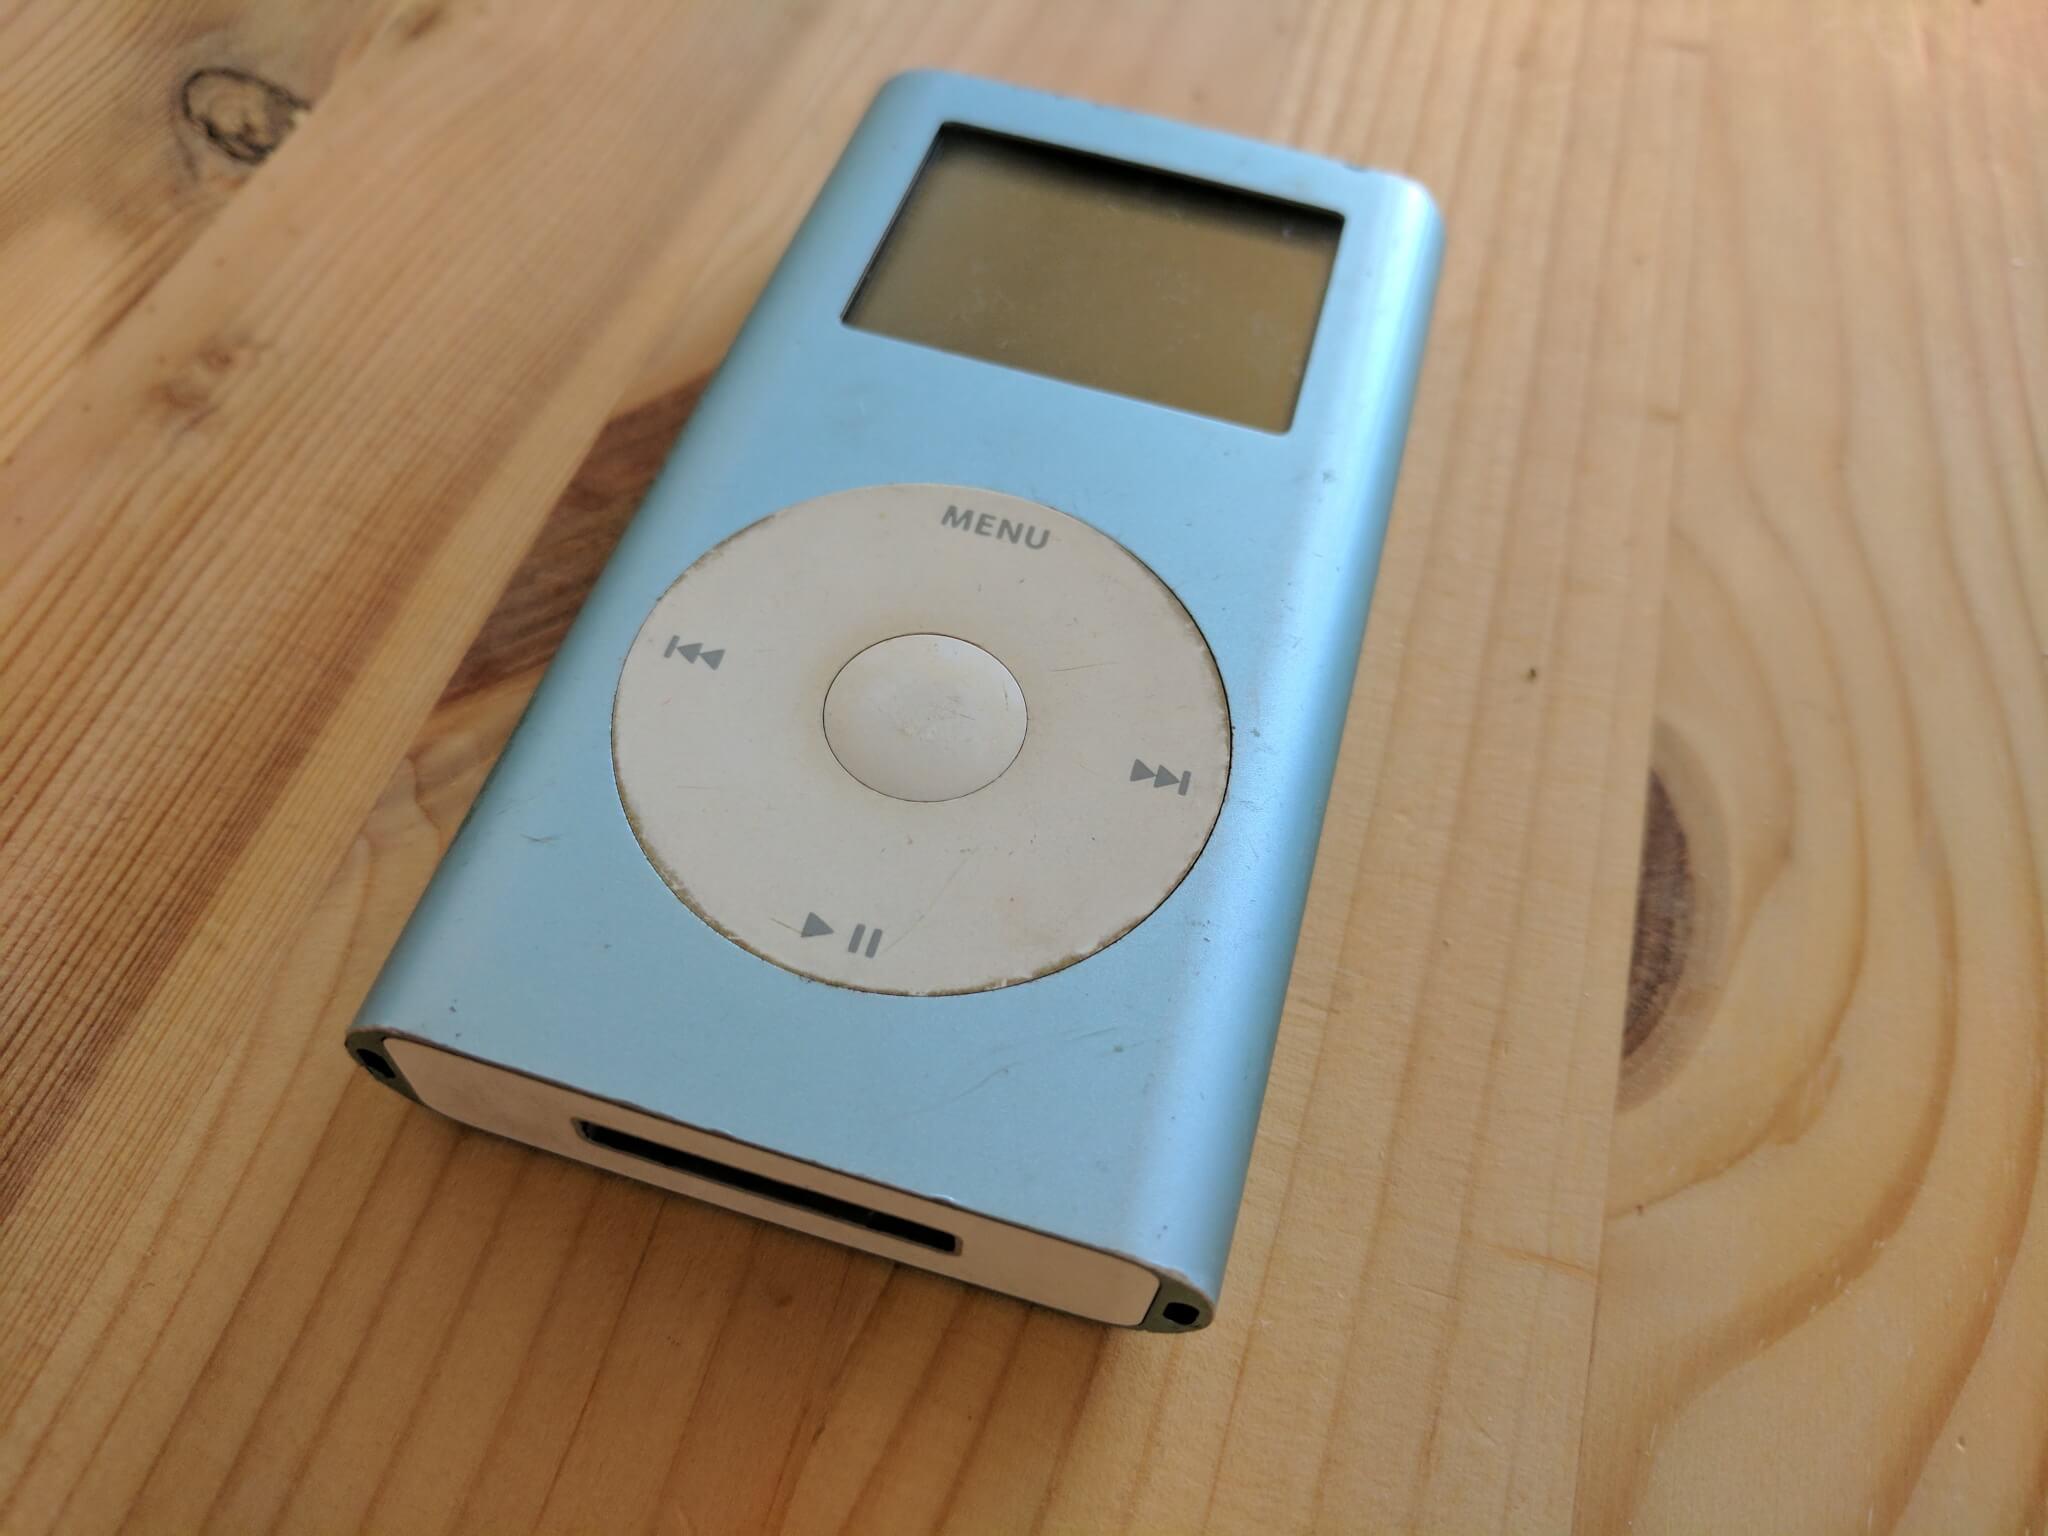 My iPod mini from 2004.